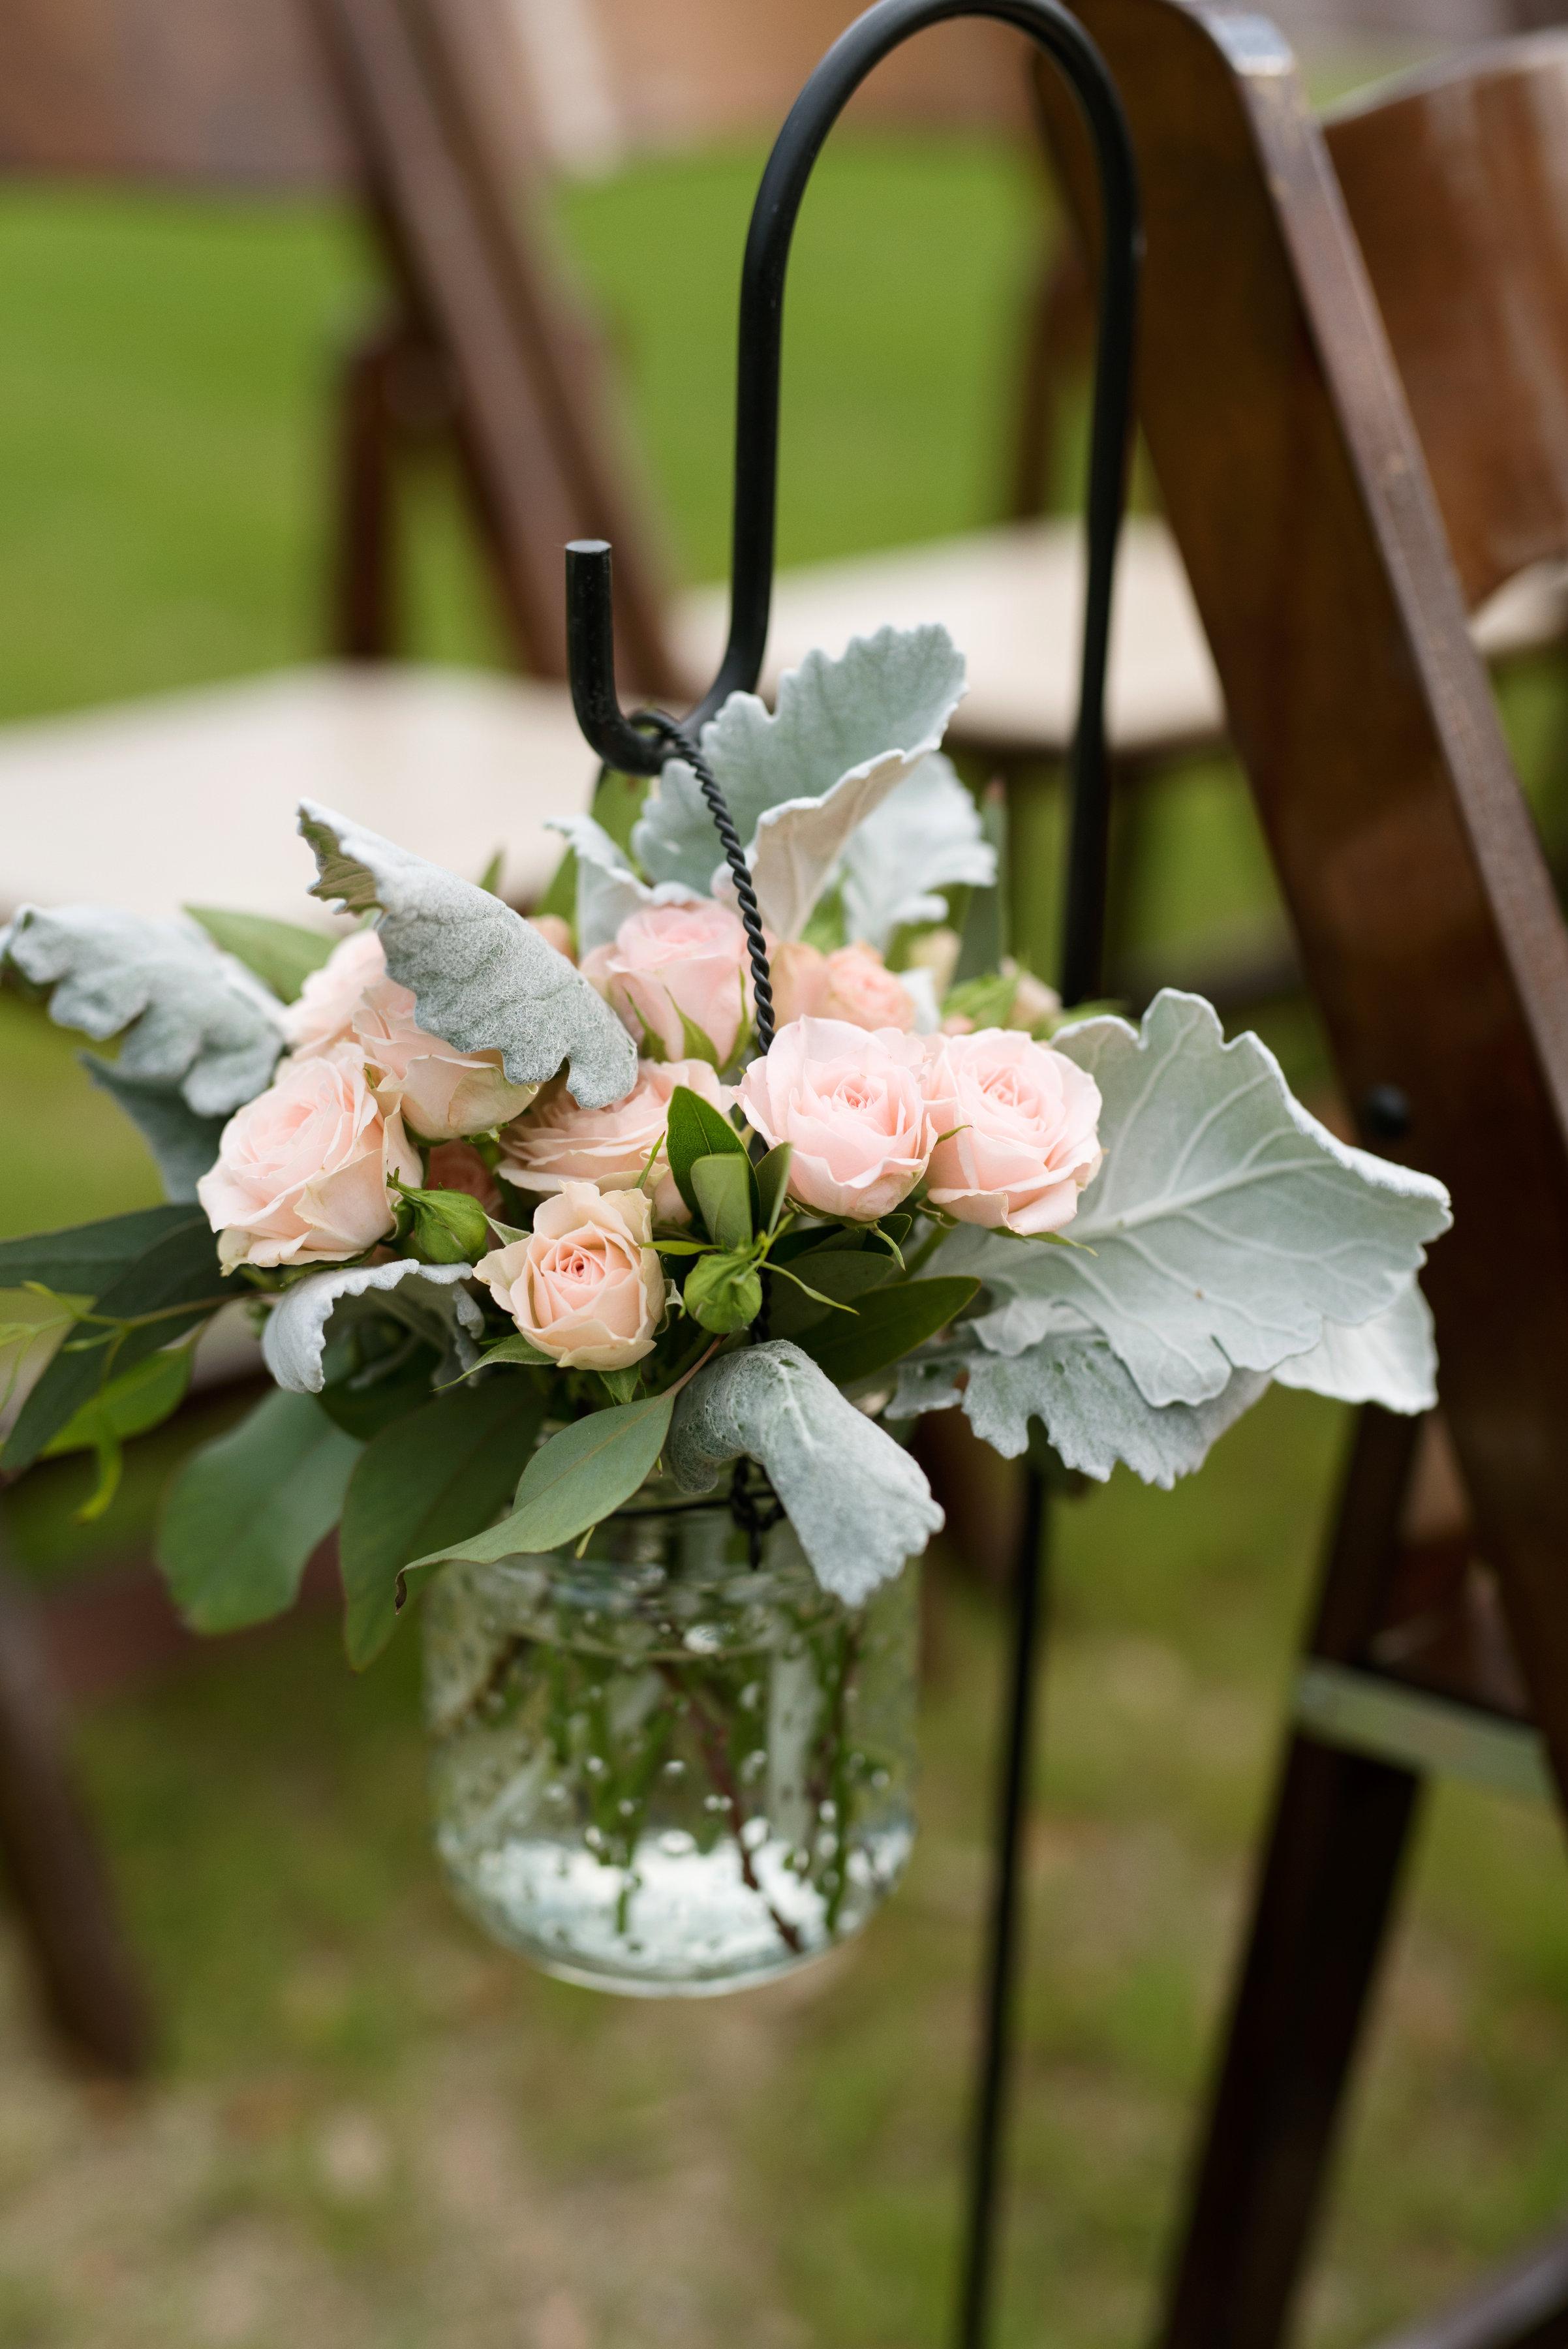 Ma Maison Austin Wedding Venue_ Austin Wedding Planner Heavenly Day Events _ Kristi Wright Austin Wedding Photographer20160306_0141.JPG